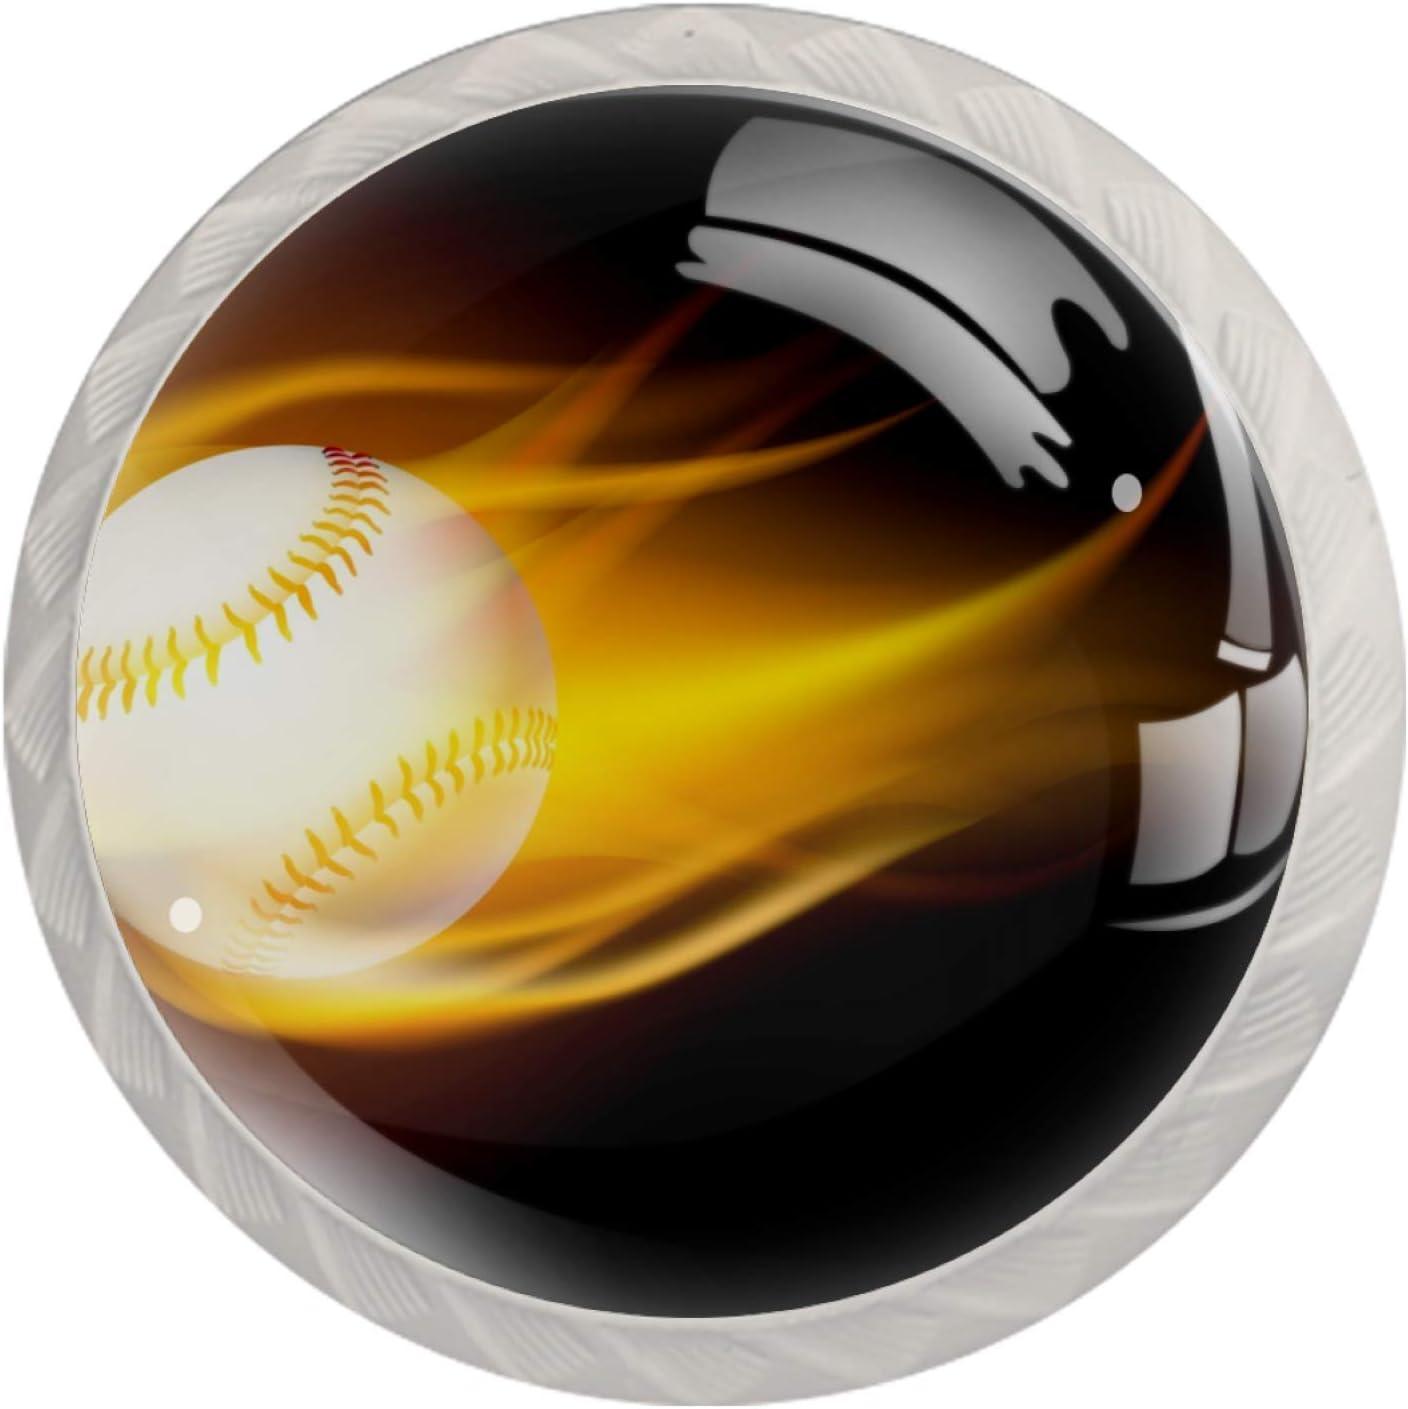 Idealiy Baseball Fire Door Drawer Decorati Handle Pull Furniture New sales latest